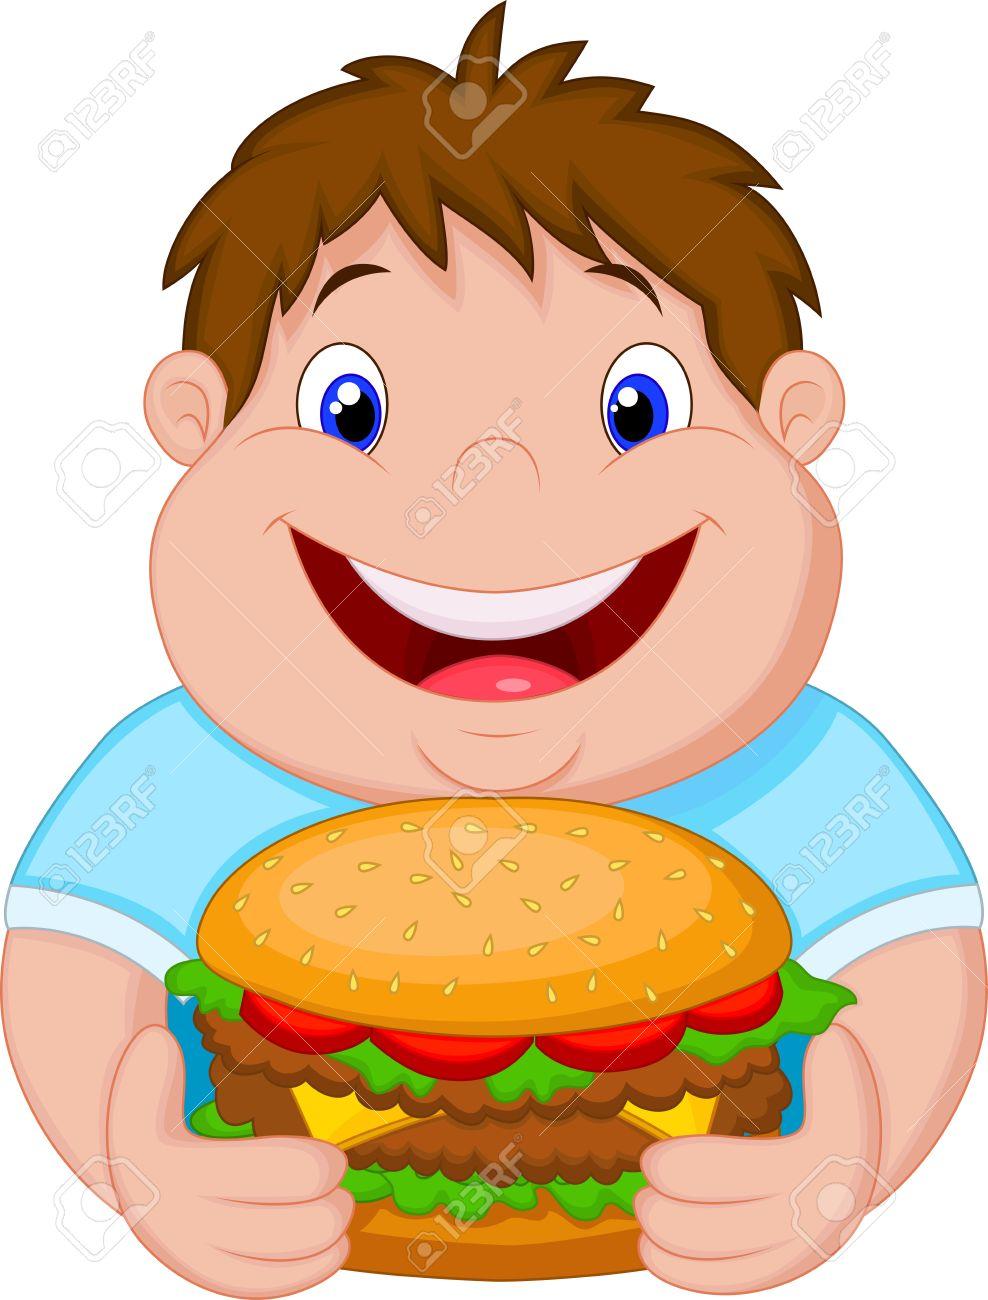 Fat boy cartoon smiling and ready to eat a big hamburger Stock Vector - 23462793